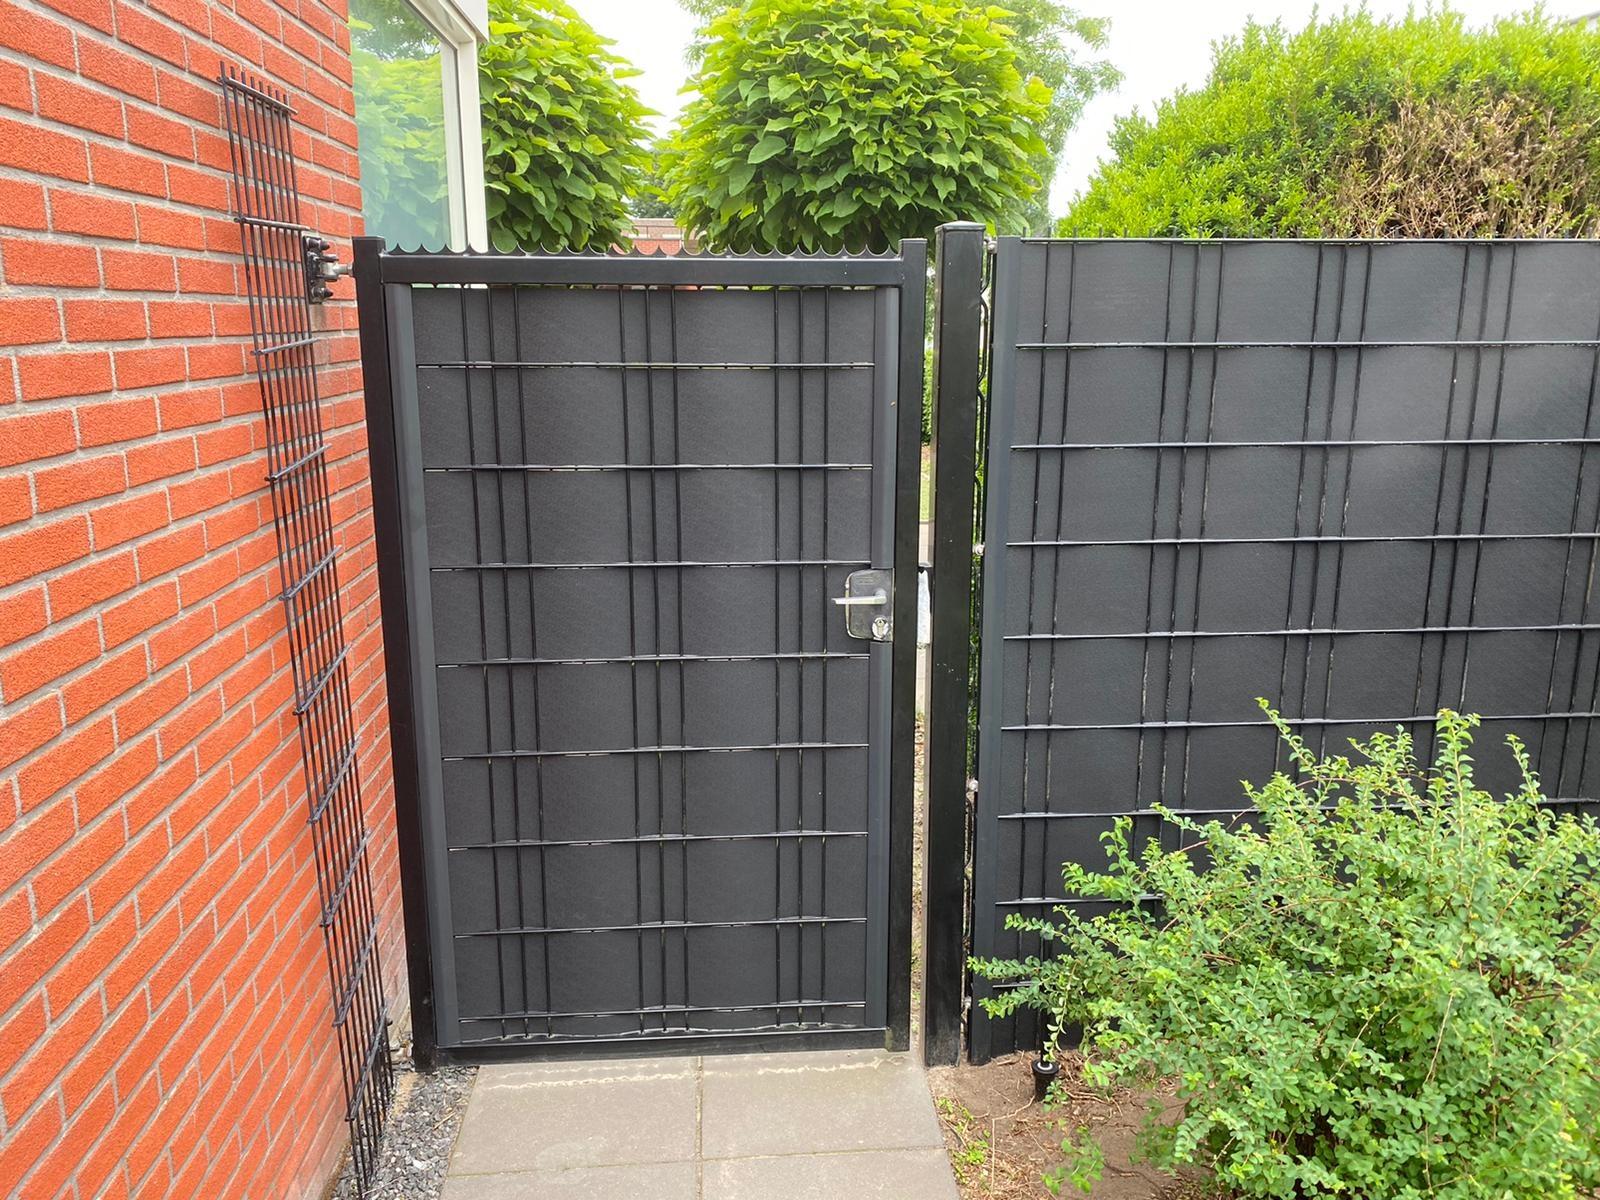 Gipea Easy To Fix Optimal Visibility Protection For Gate & Fence 9  banen ekoband van 85 cm tot 105 cm + Master Fix Afwerk Profielen